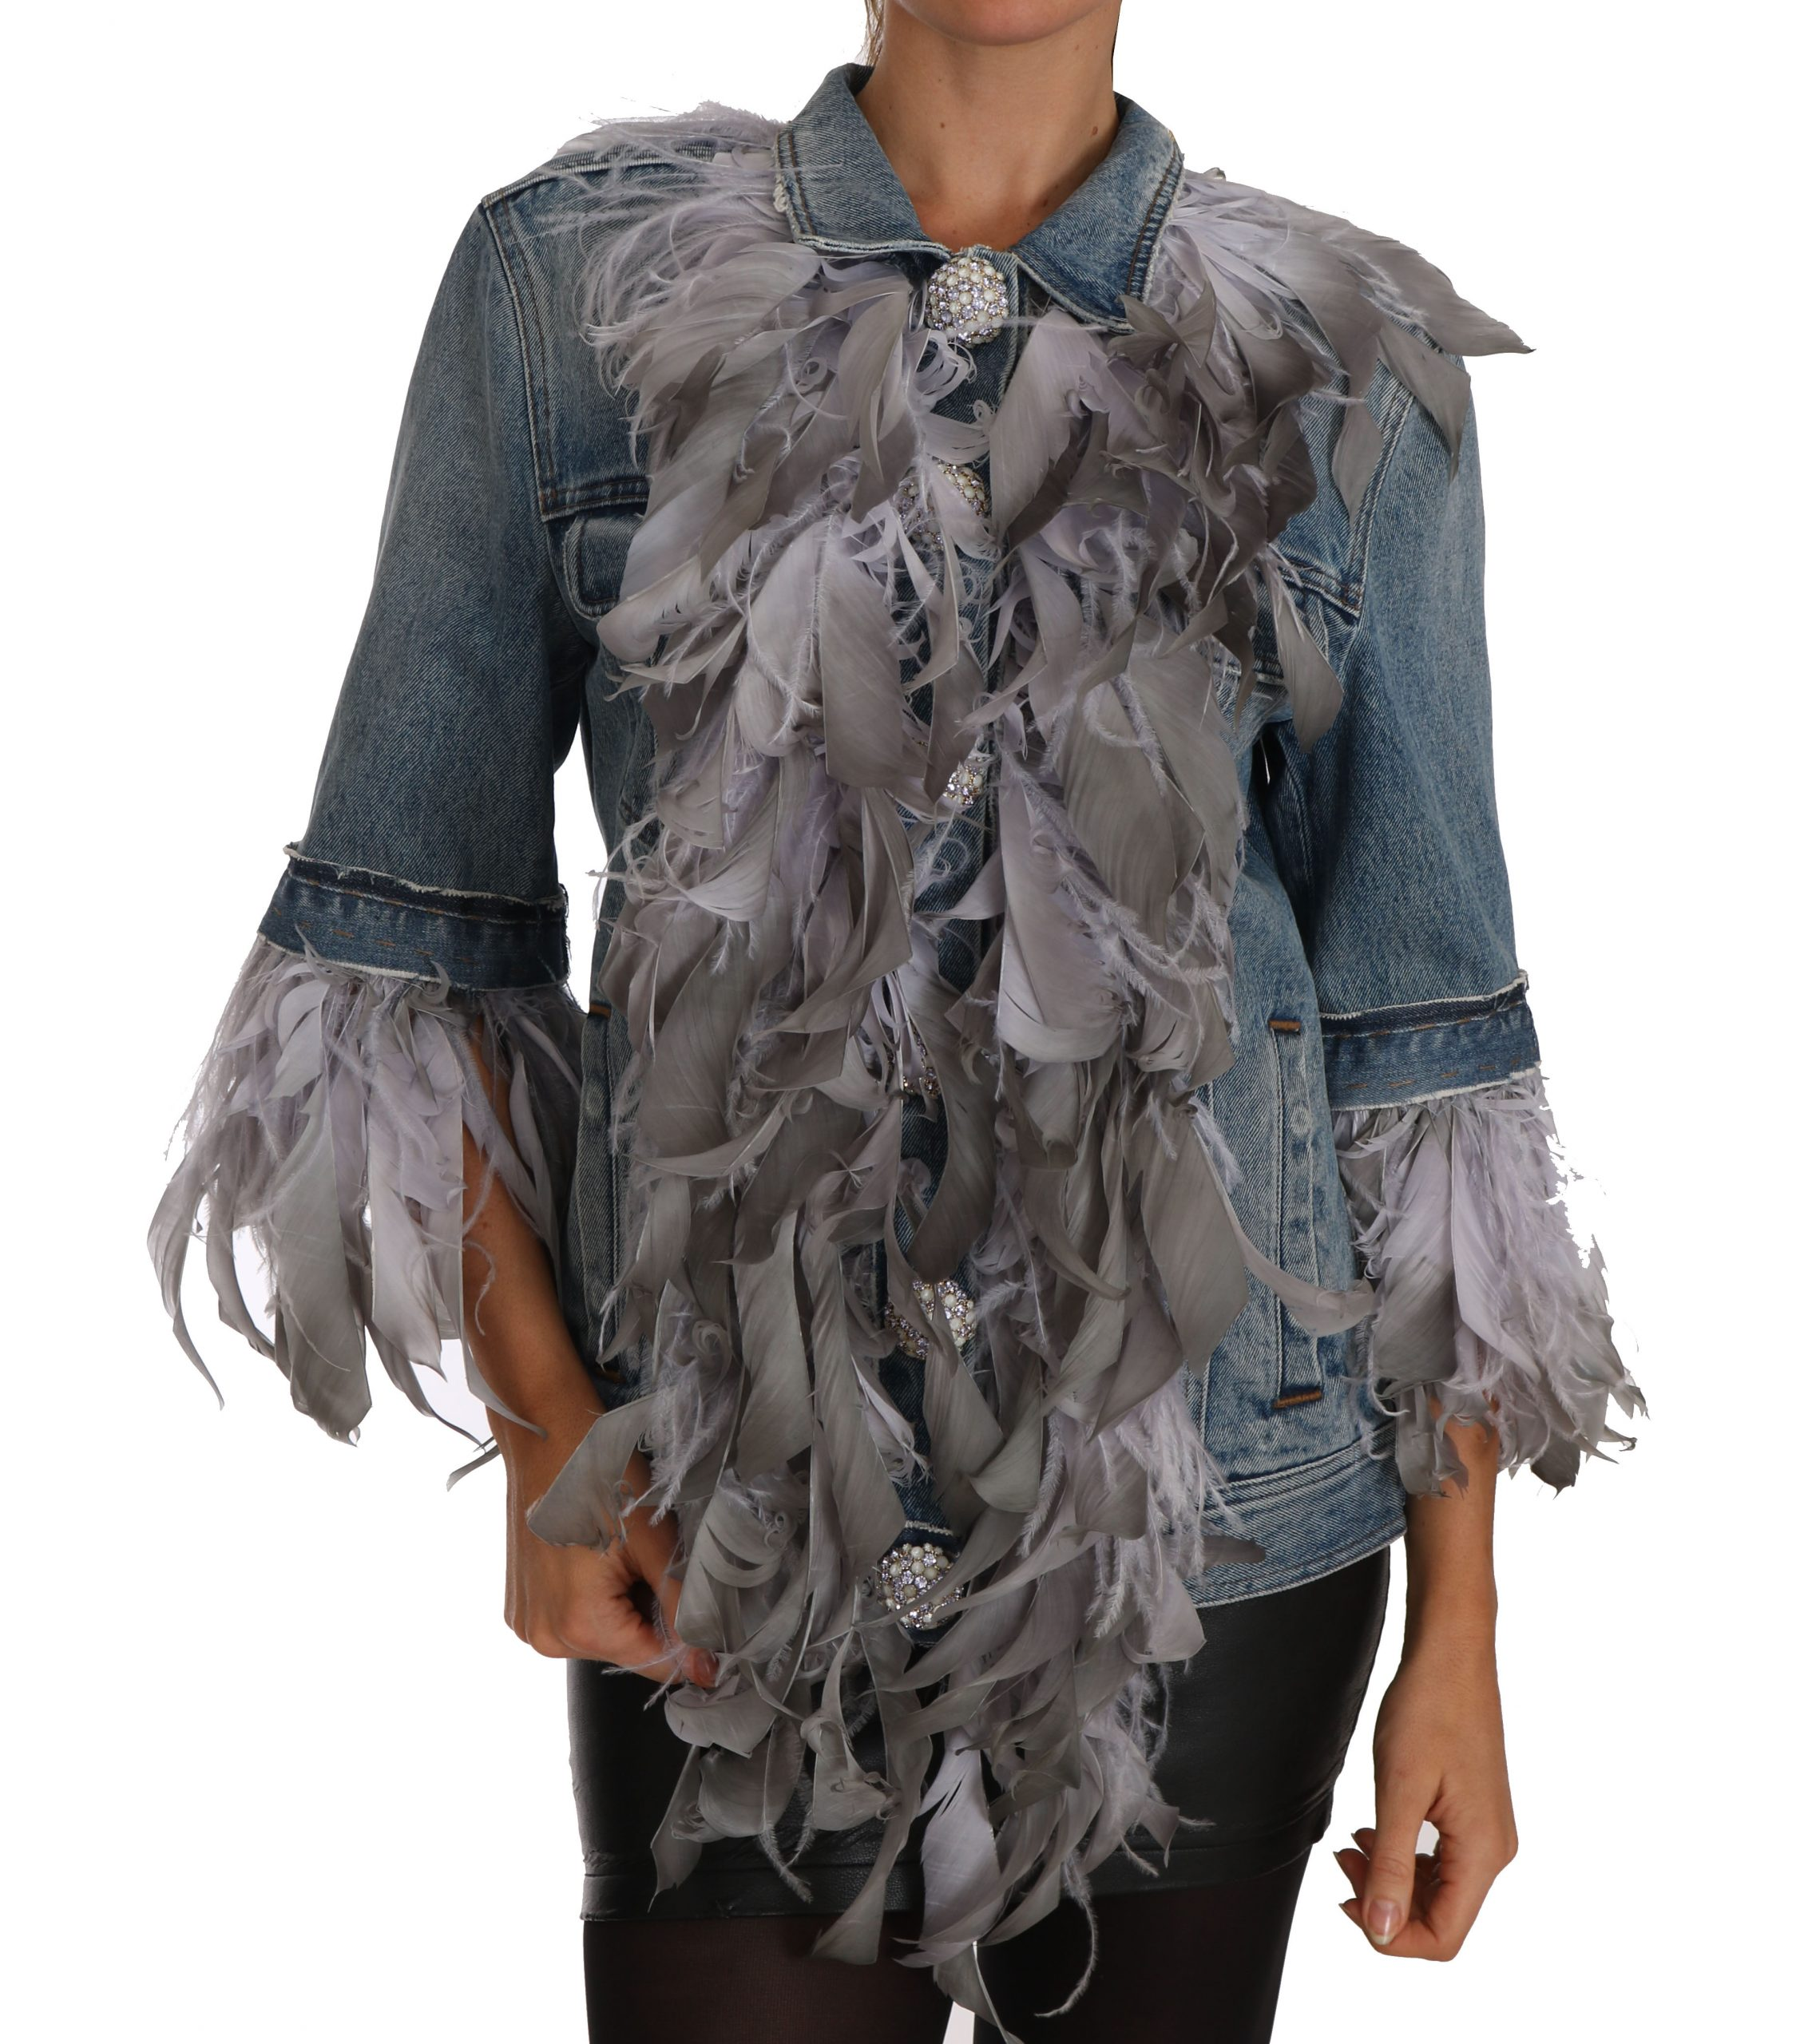 Dolce & Gabbana Women's Denim Feathers Embellished Buttons Jacket Blue TSH2325 - IT40 S